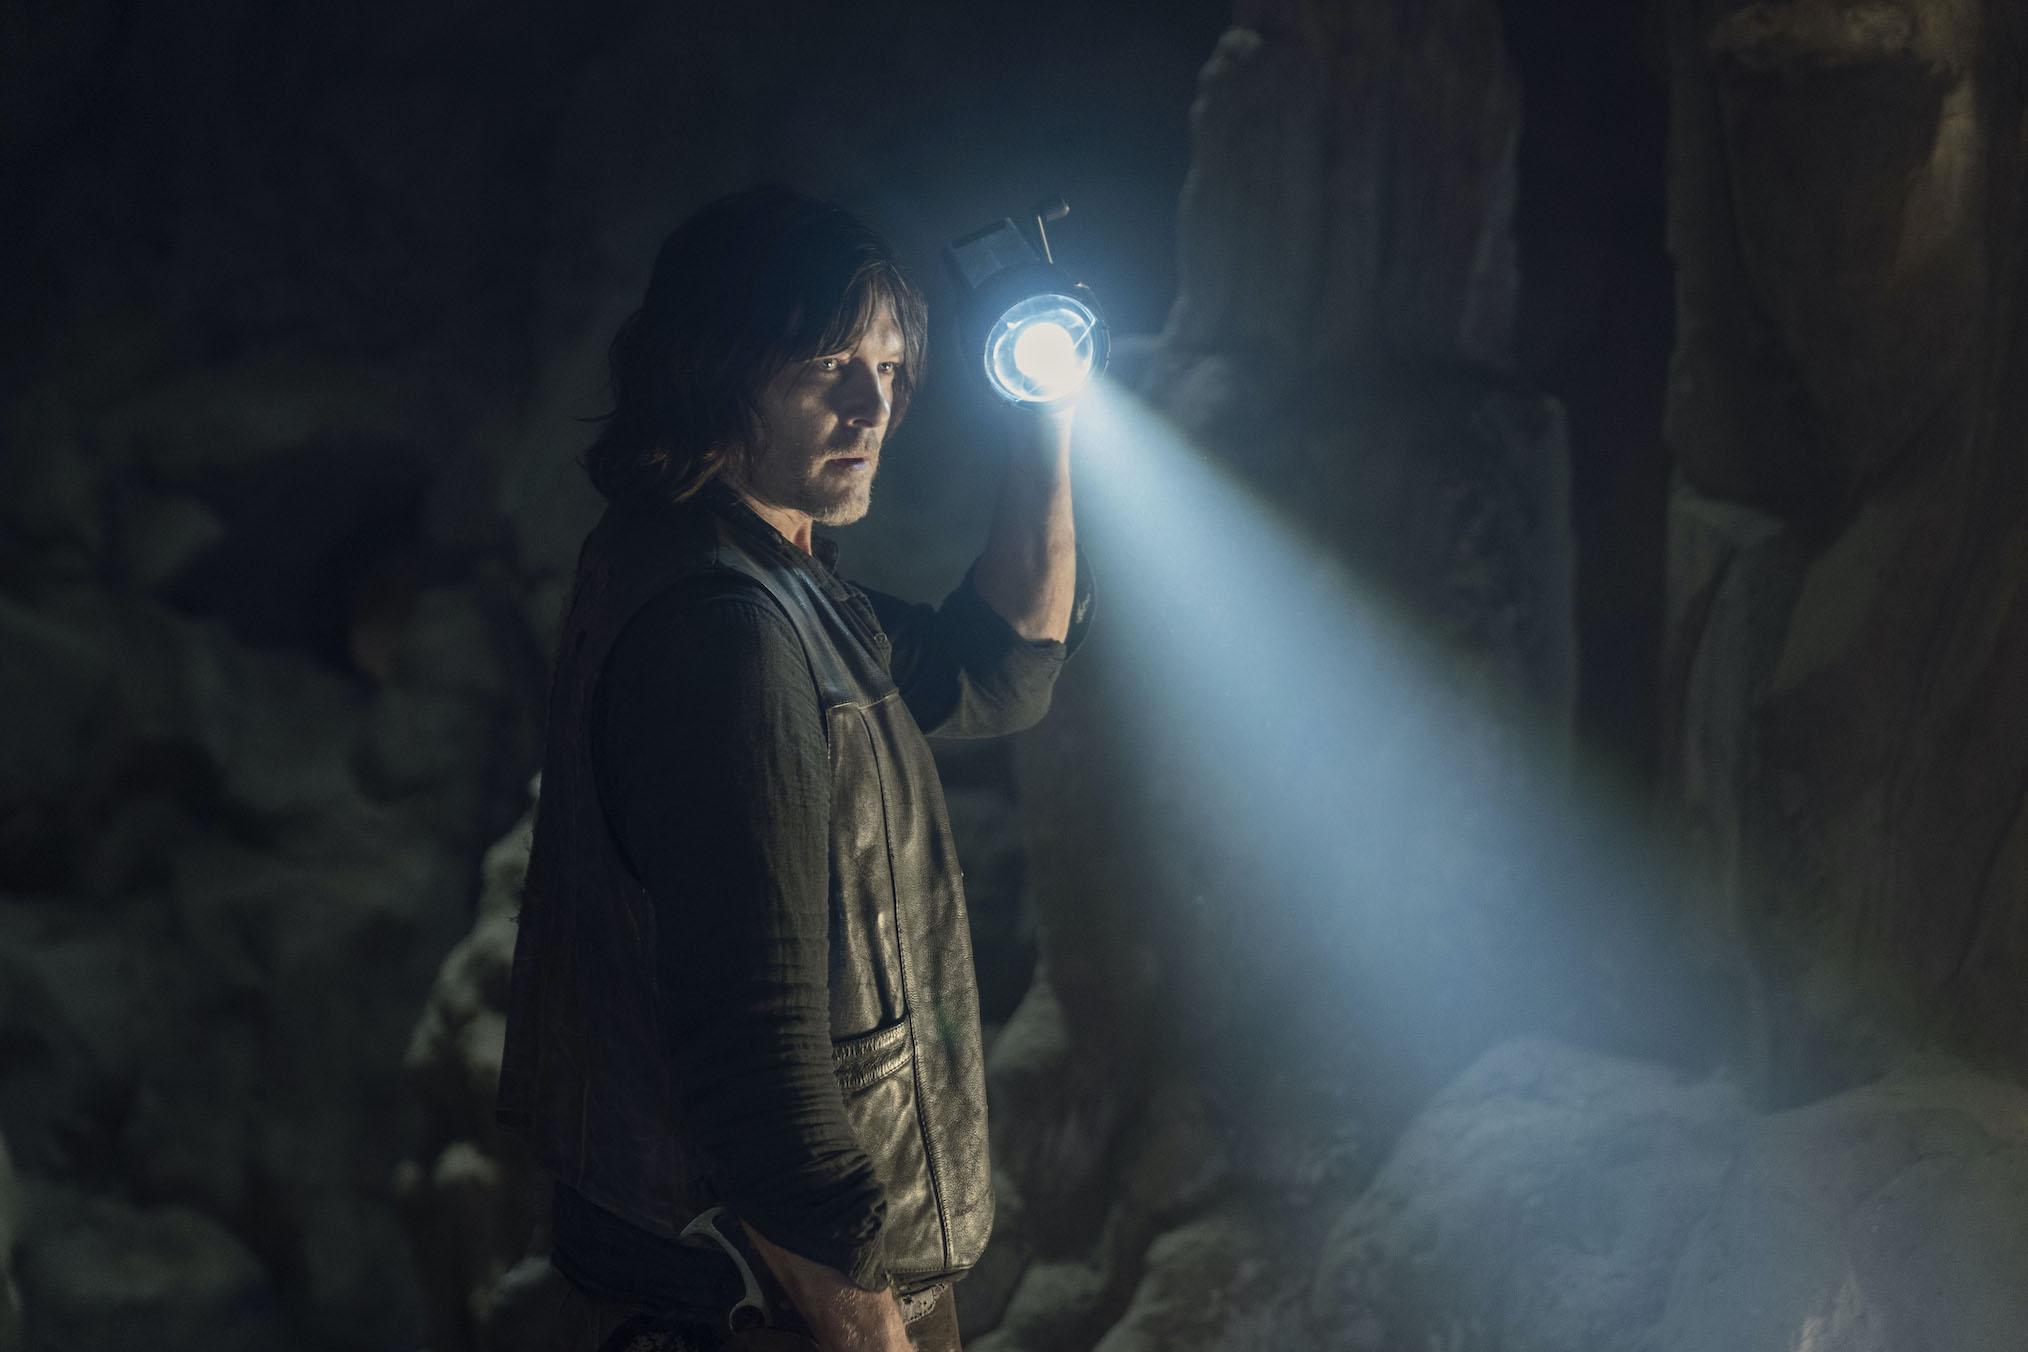 Norman Reedus Daryl Dixon Walking Dead 1009